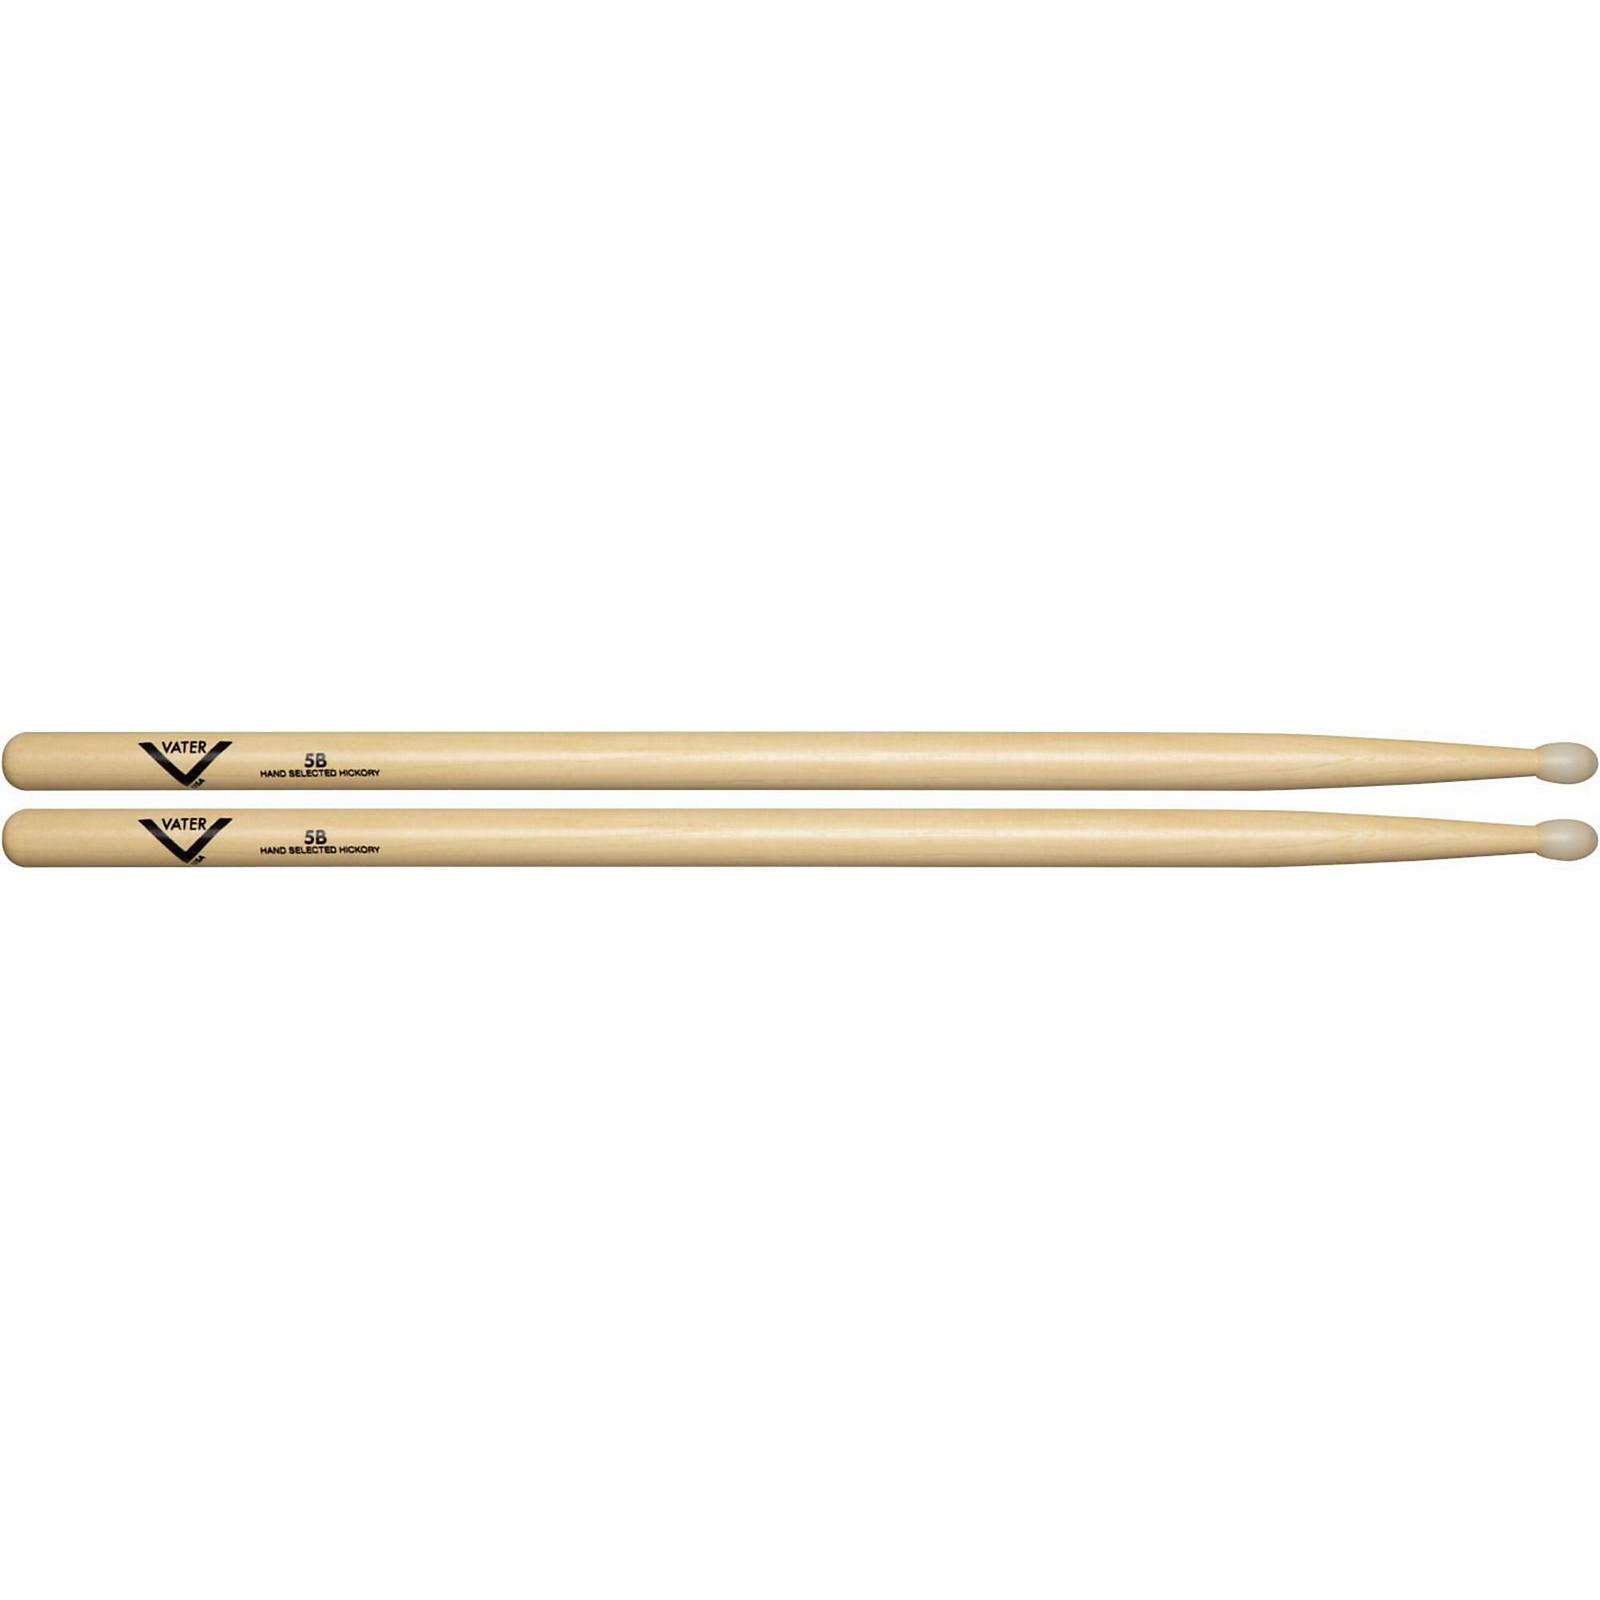 Vater American Hickory 5B Drum Sticks